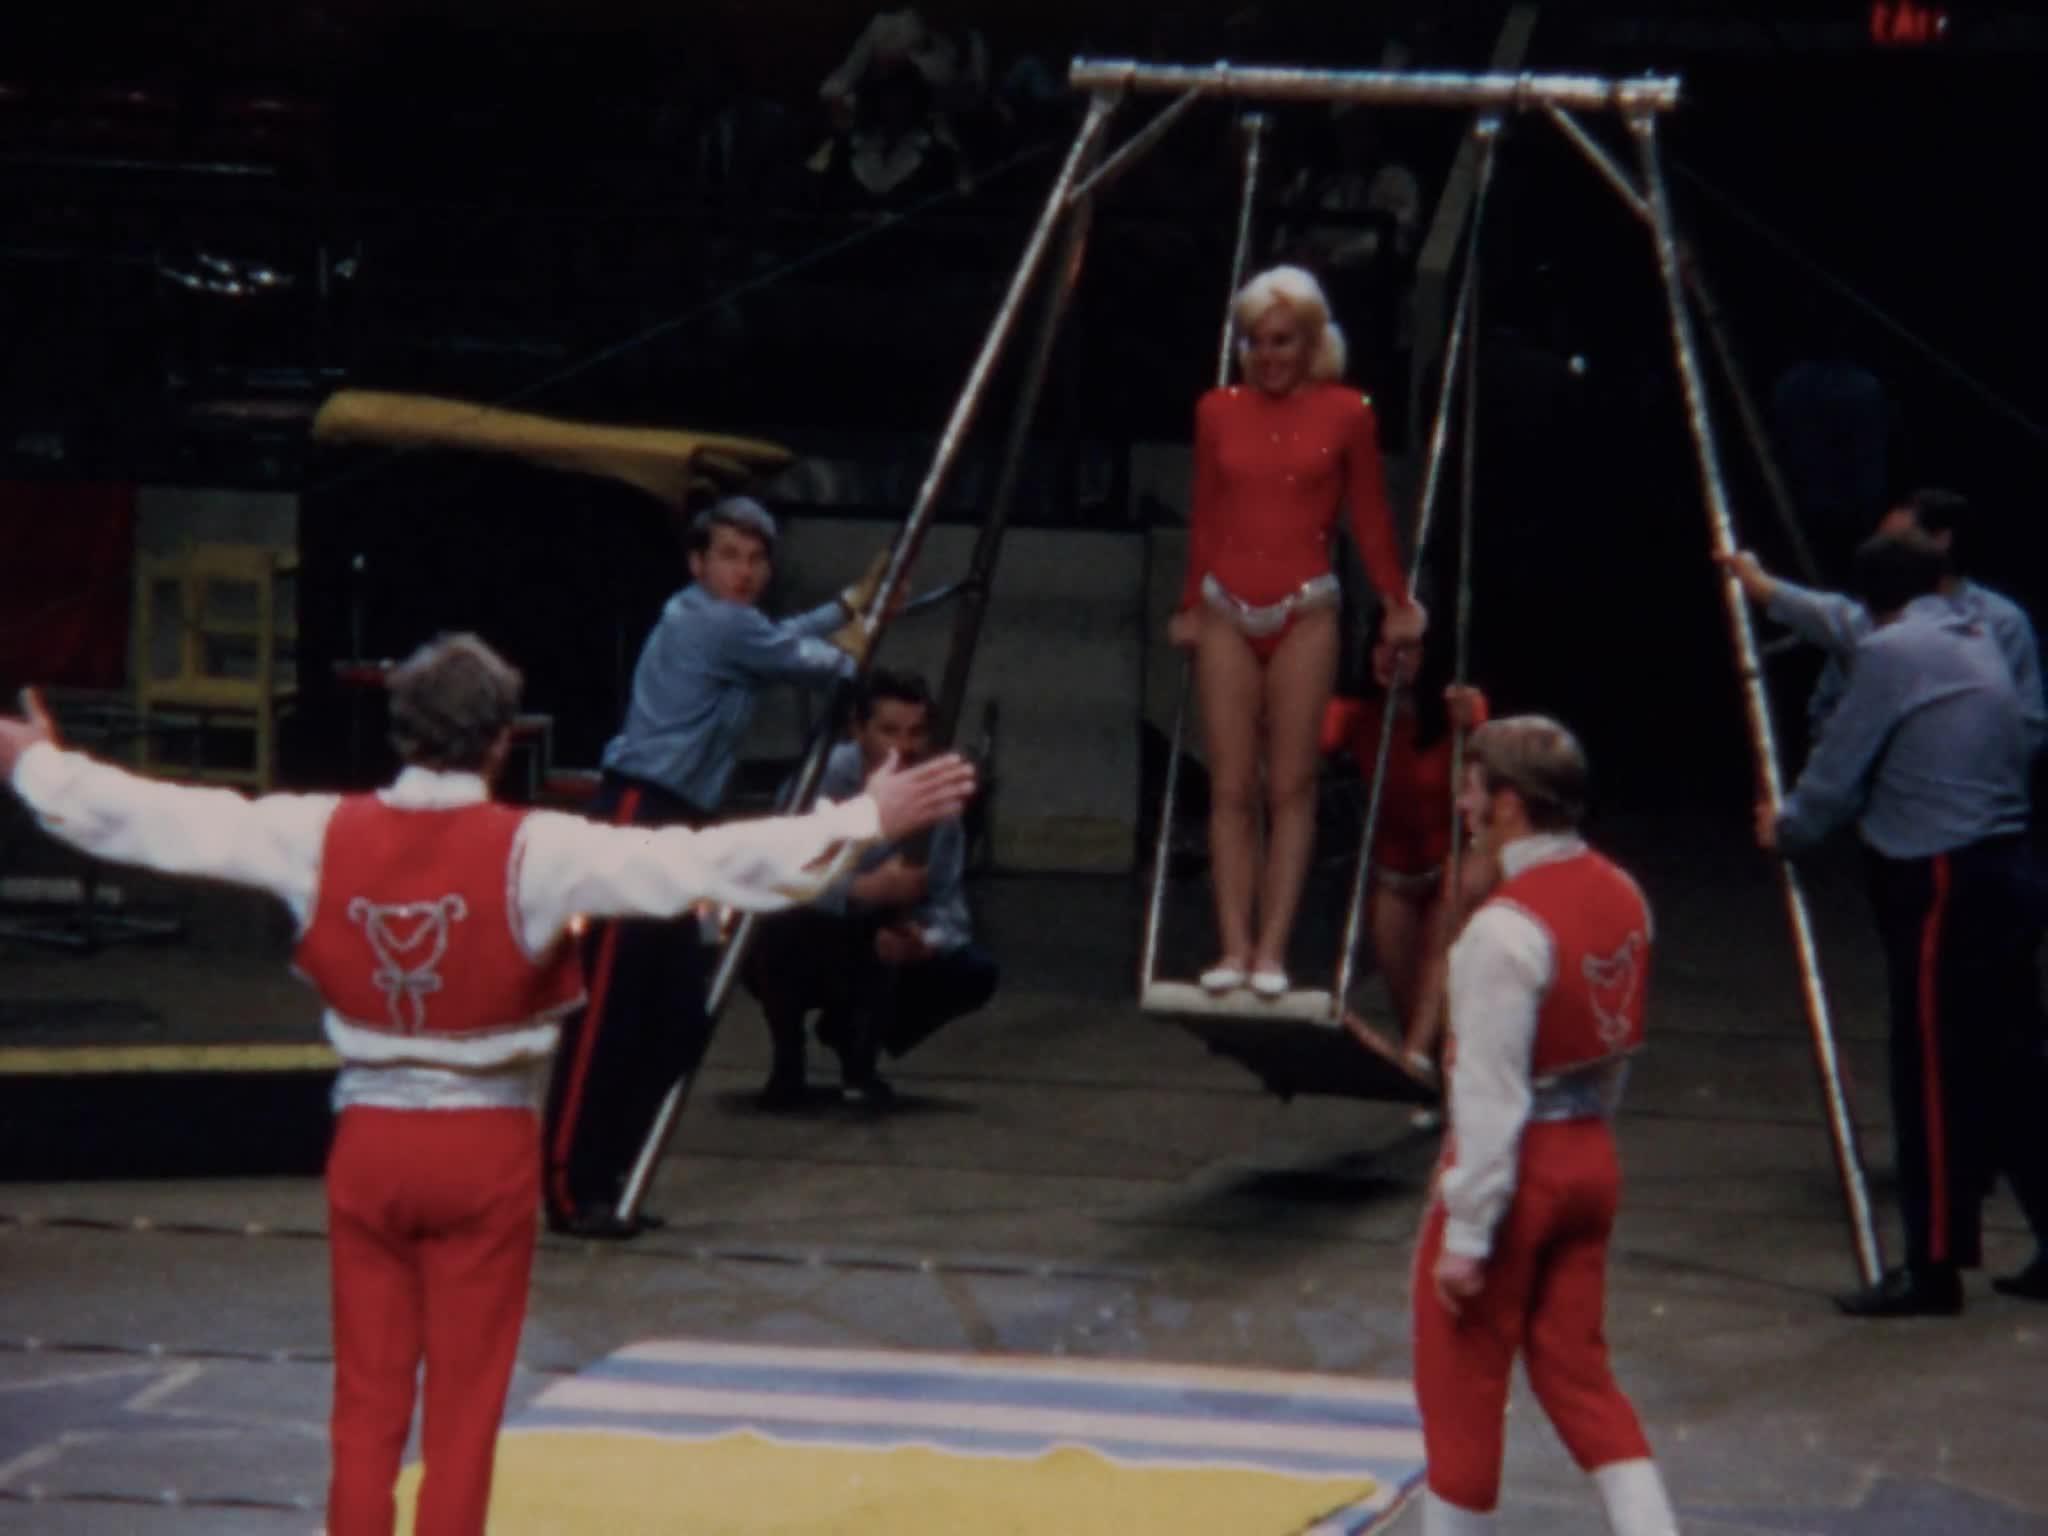 Otto Griebling, Russian Swing, Elfi Althoff, Giant Swing